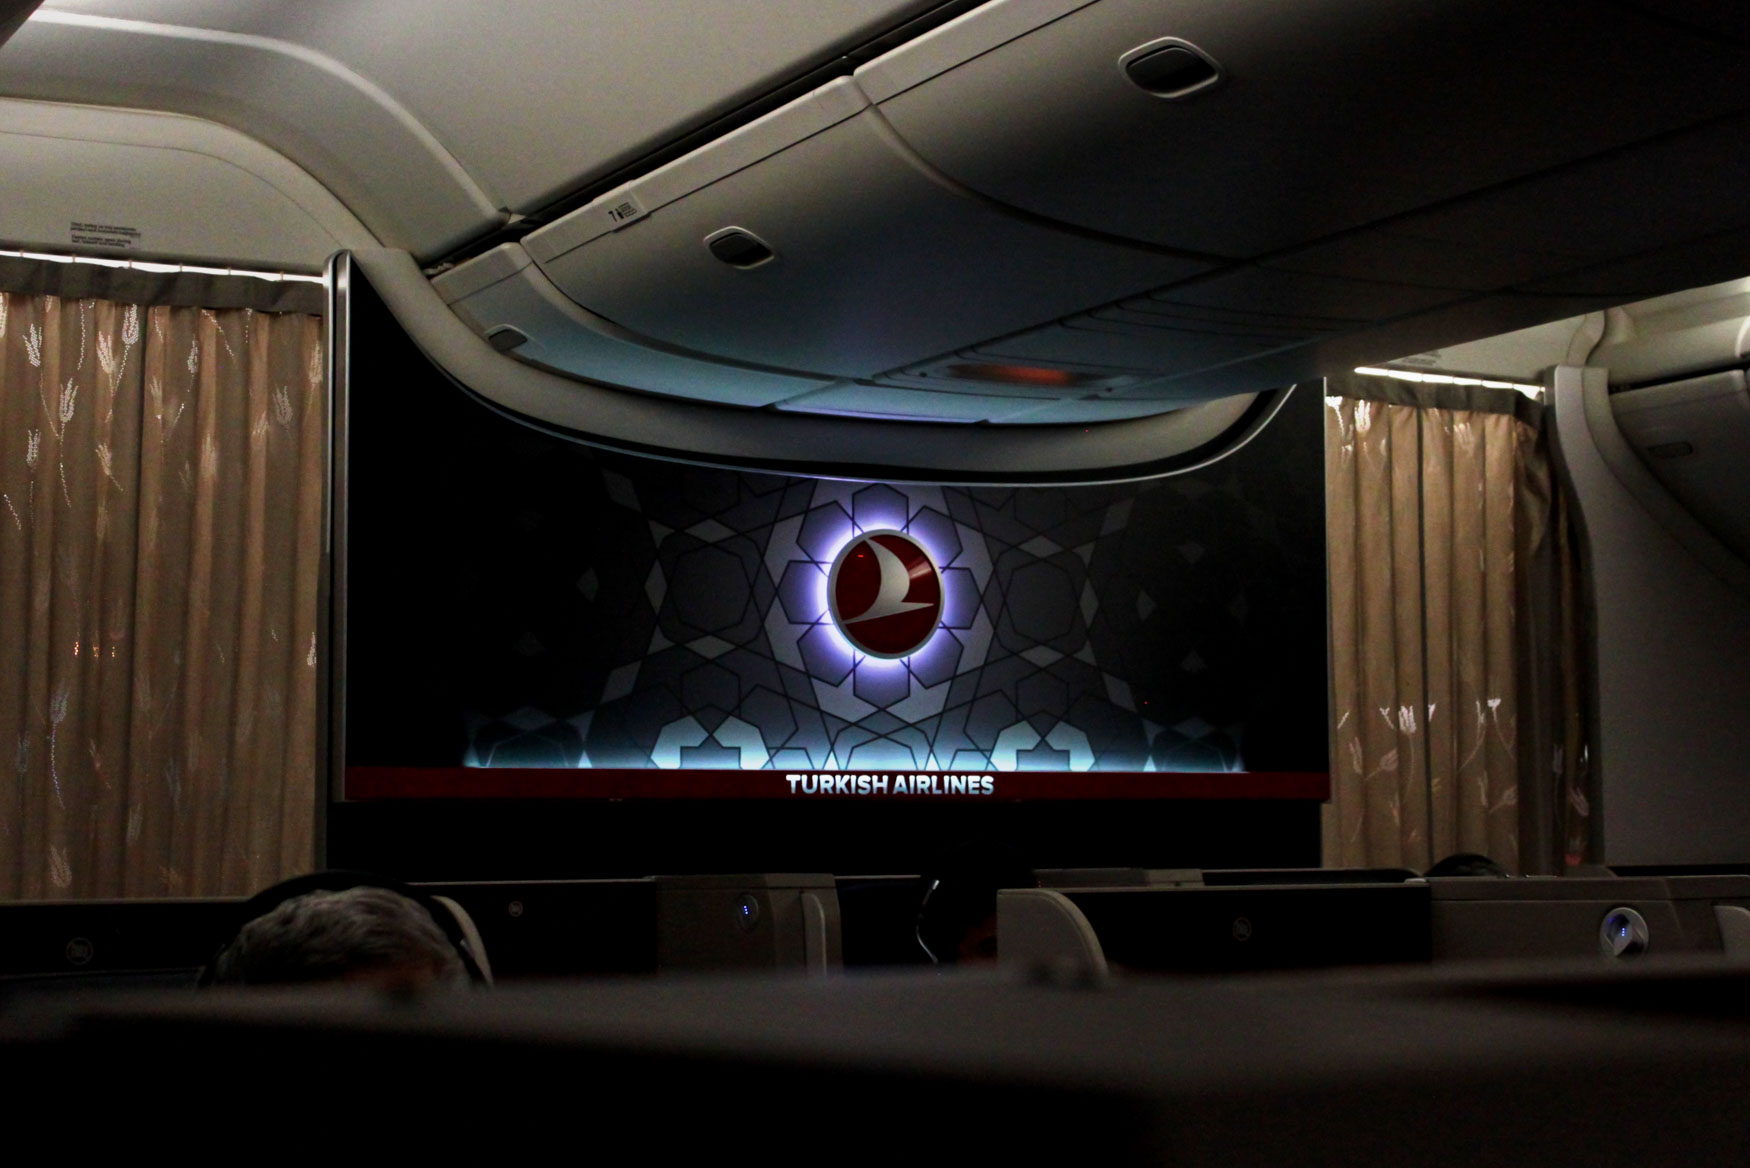 Dark Turkish Airlines Business Class Cabin